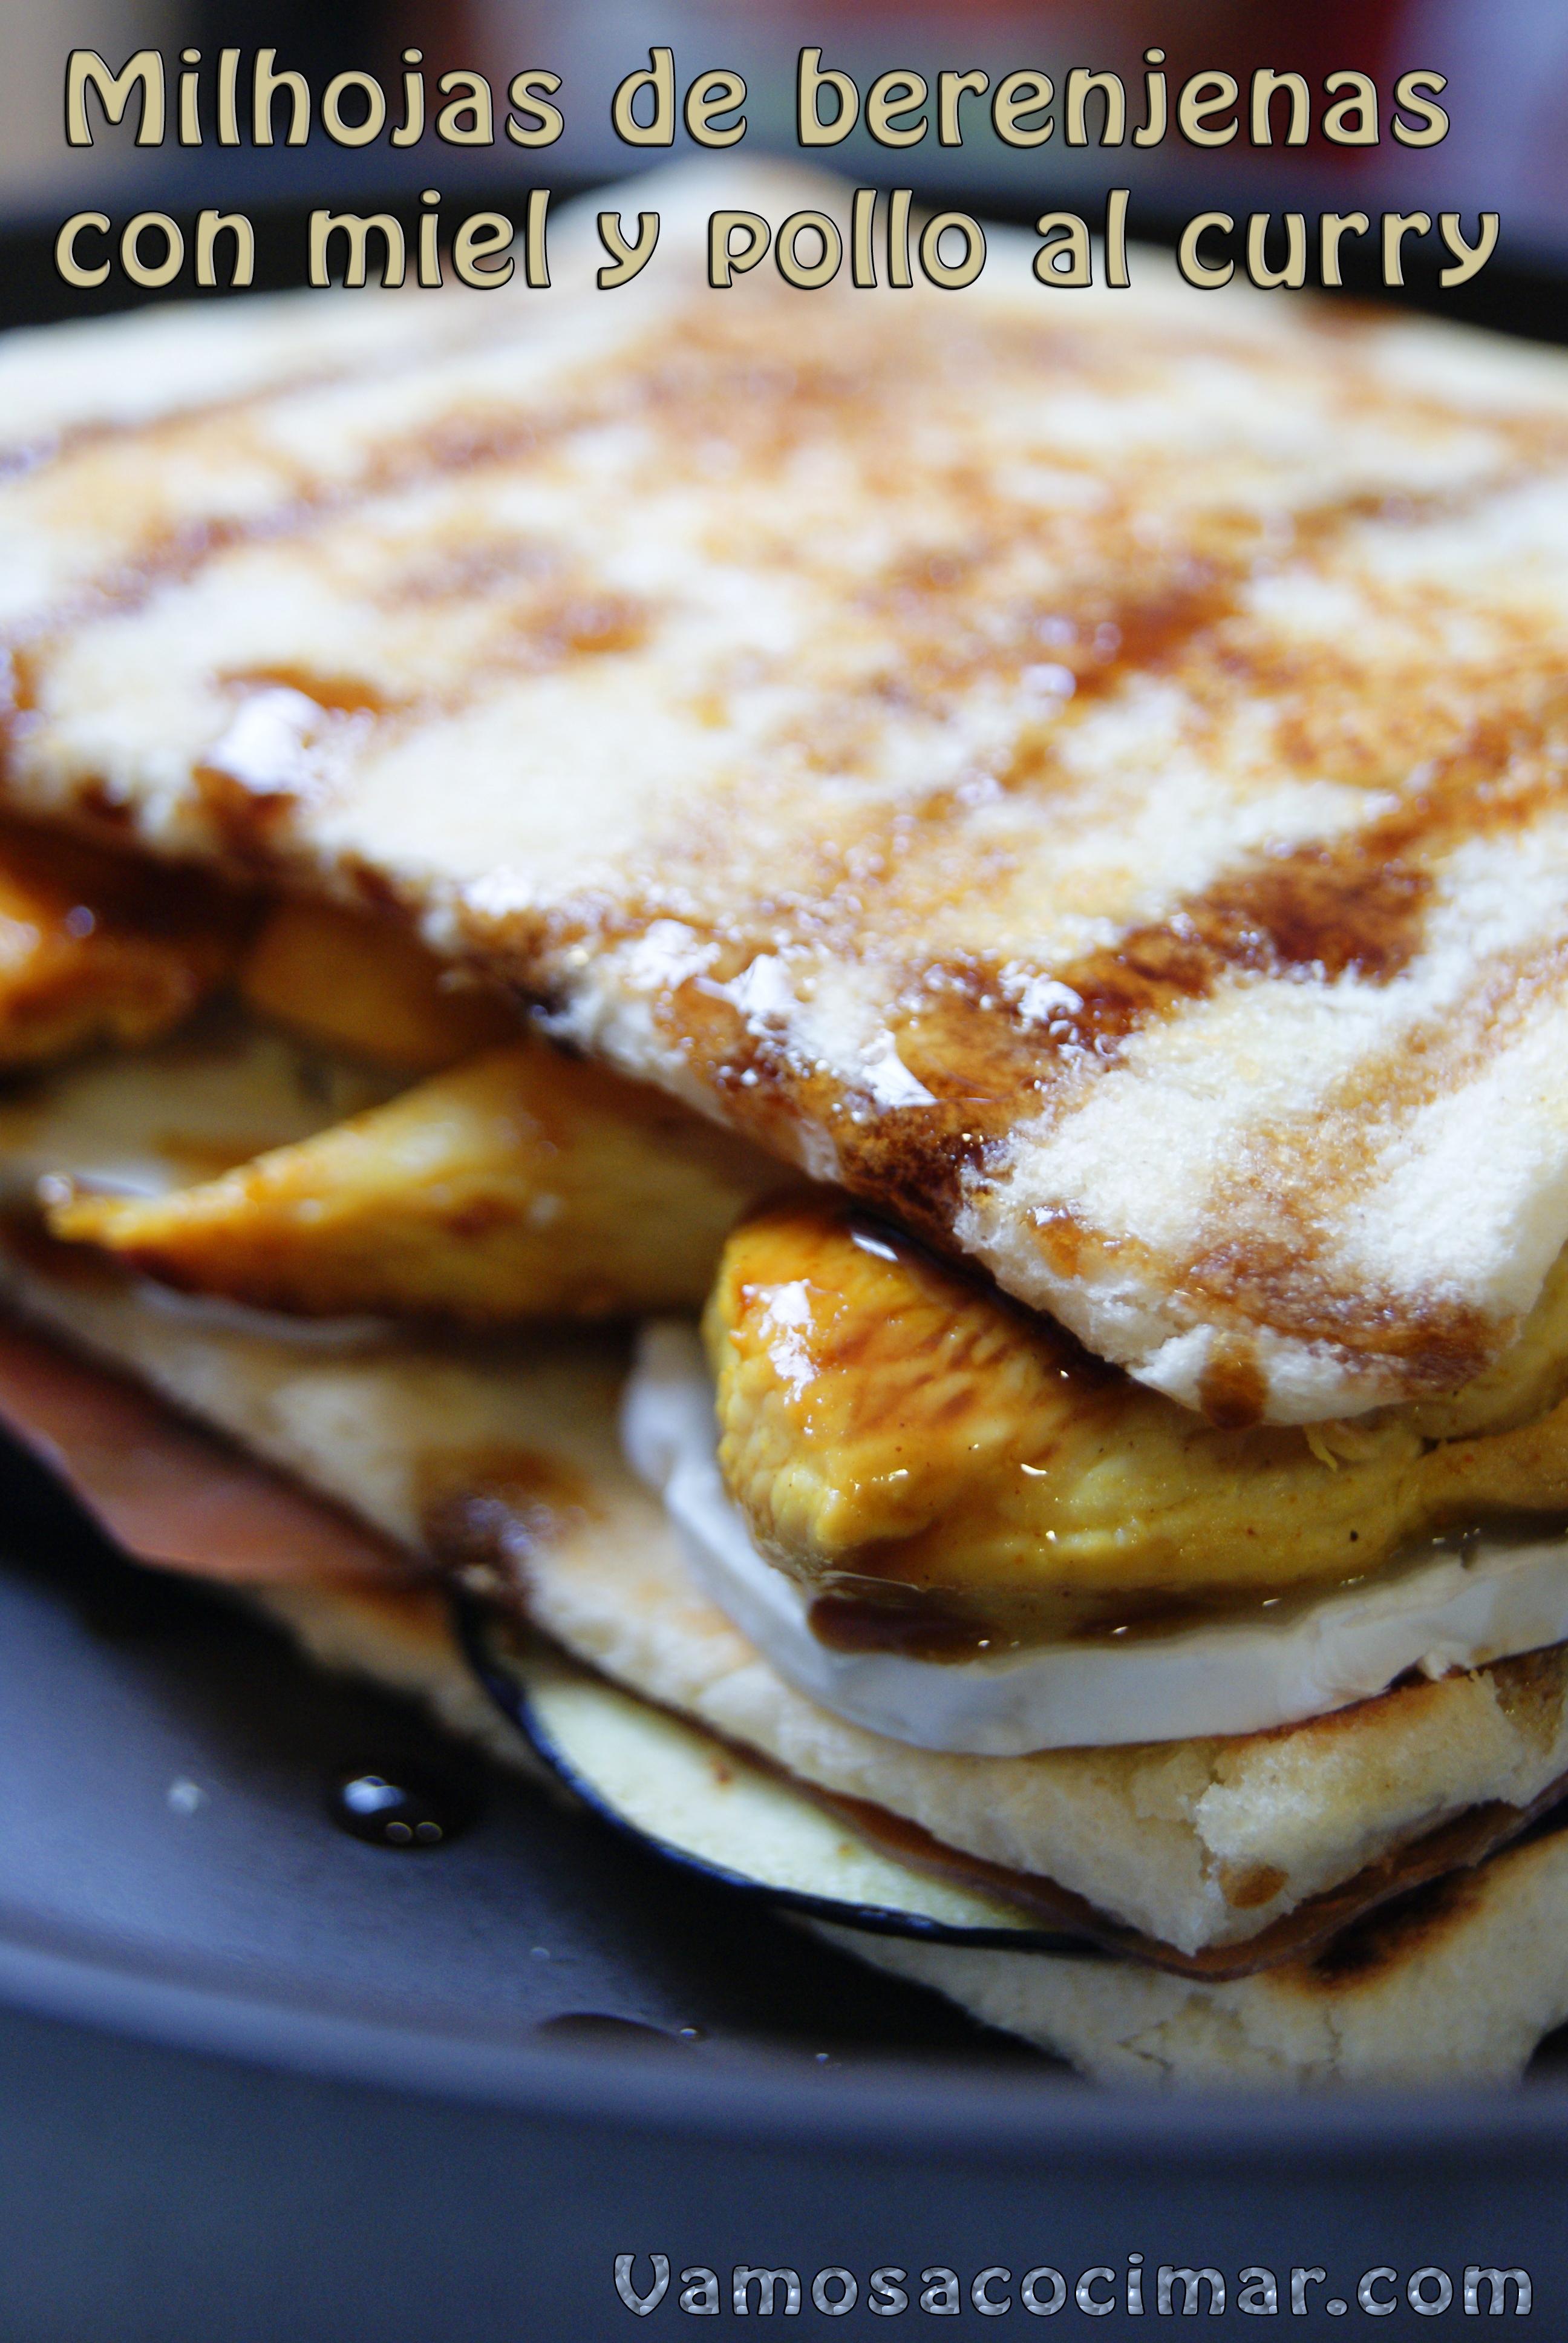 receta-milhoja-berenjena-pollo-curry-miel